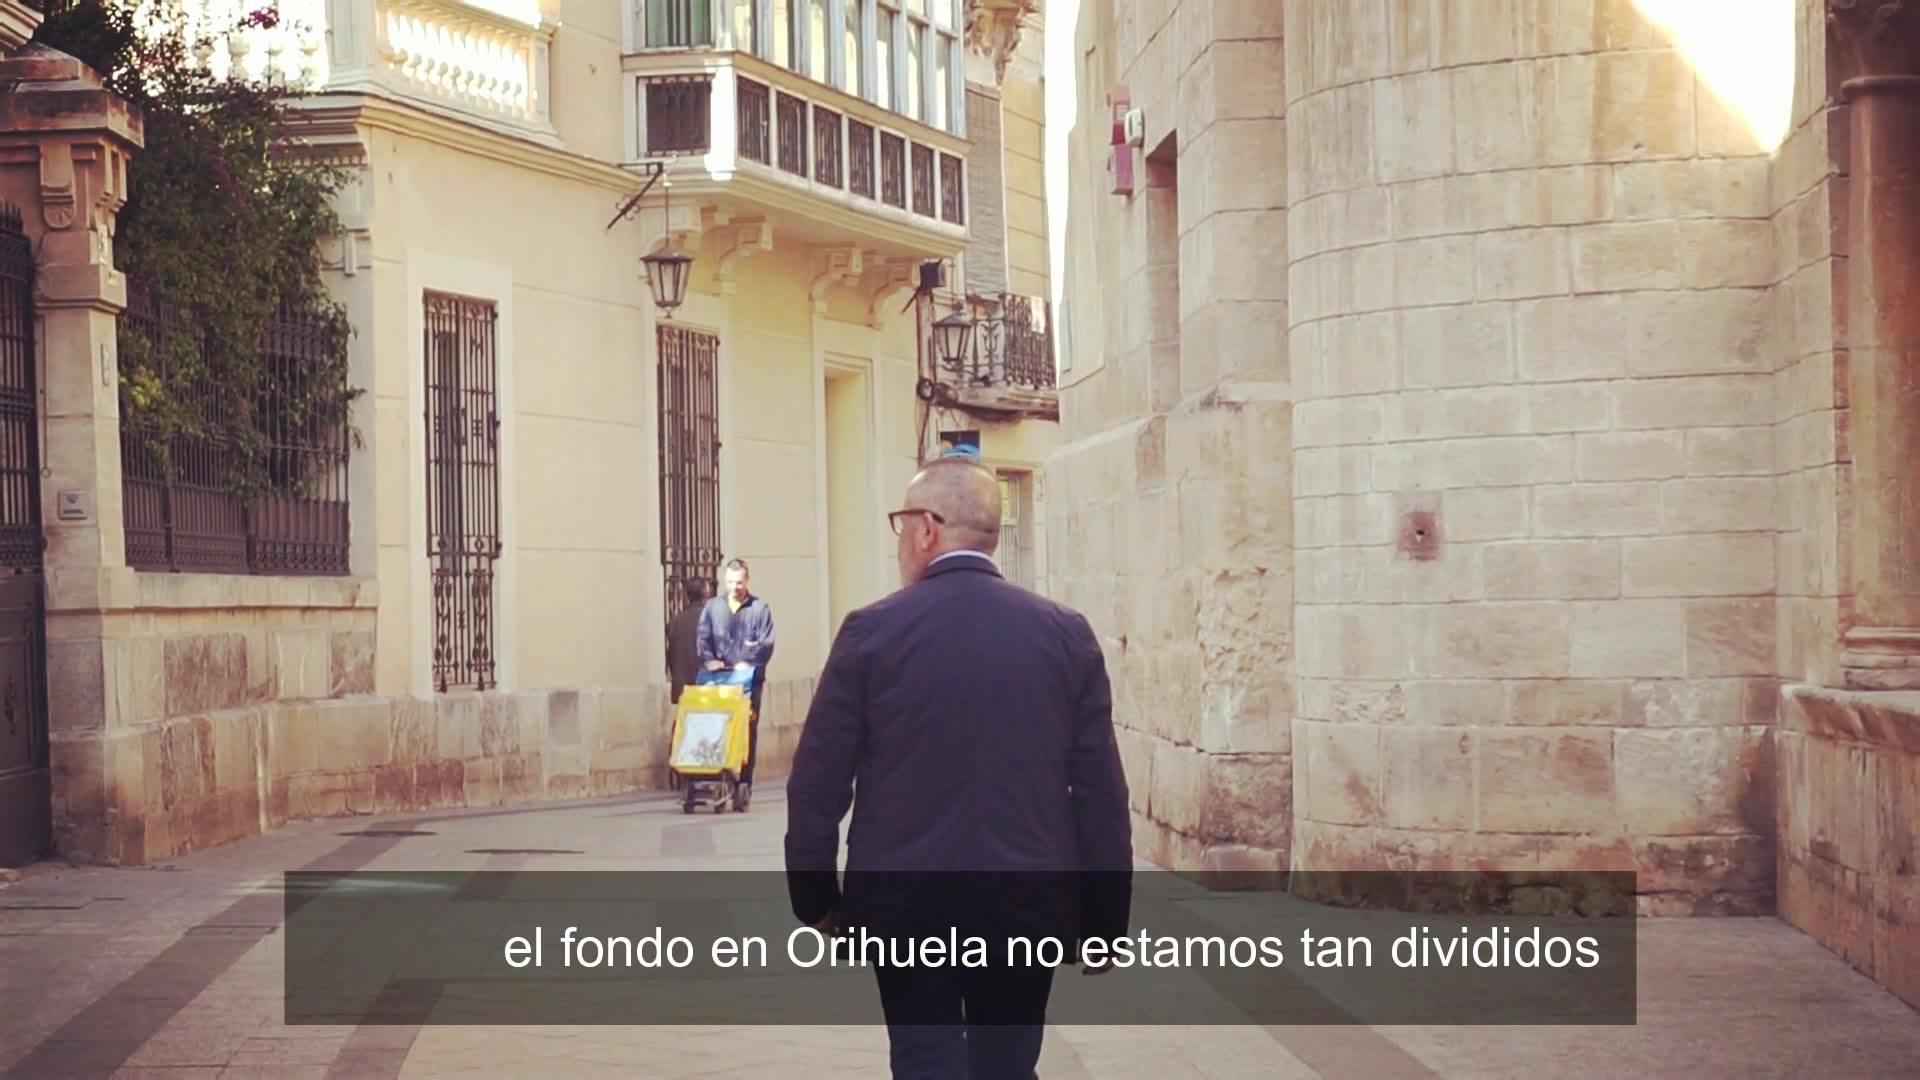 ❤️ #LaOrihuelaValiente